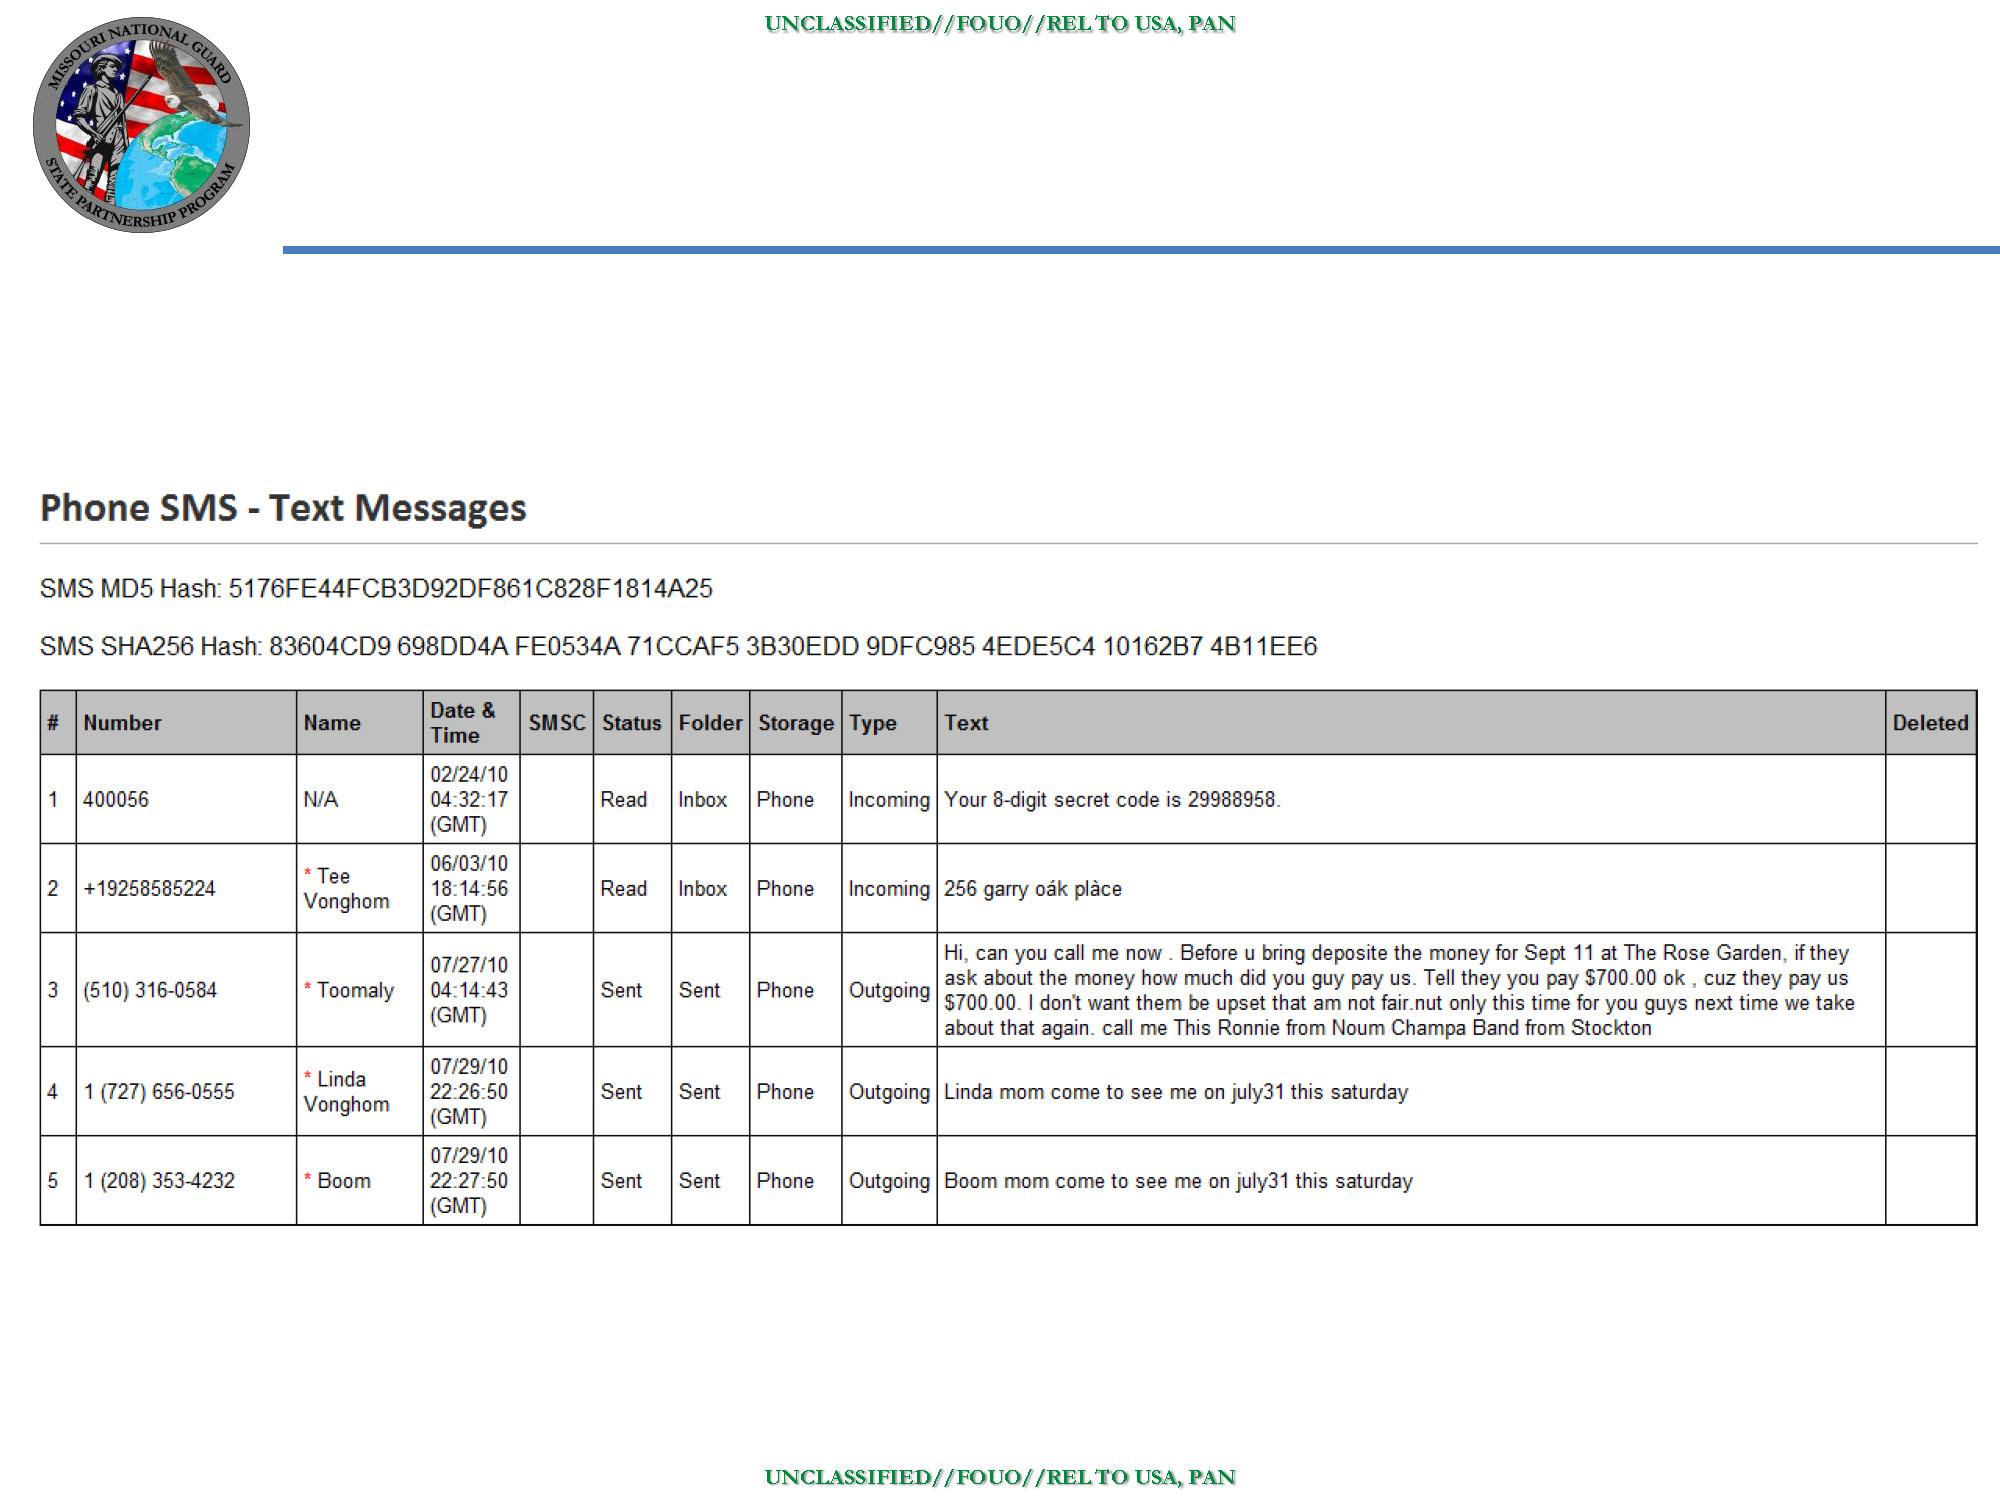 MO-PA-Surveillance-2_Page_74